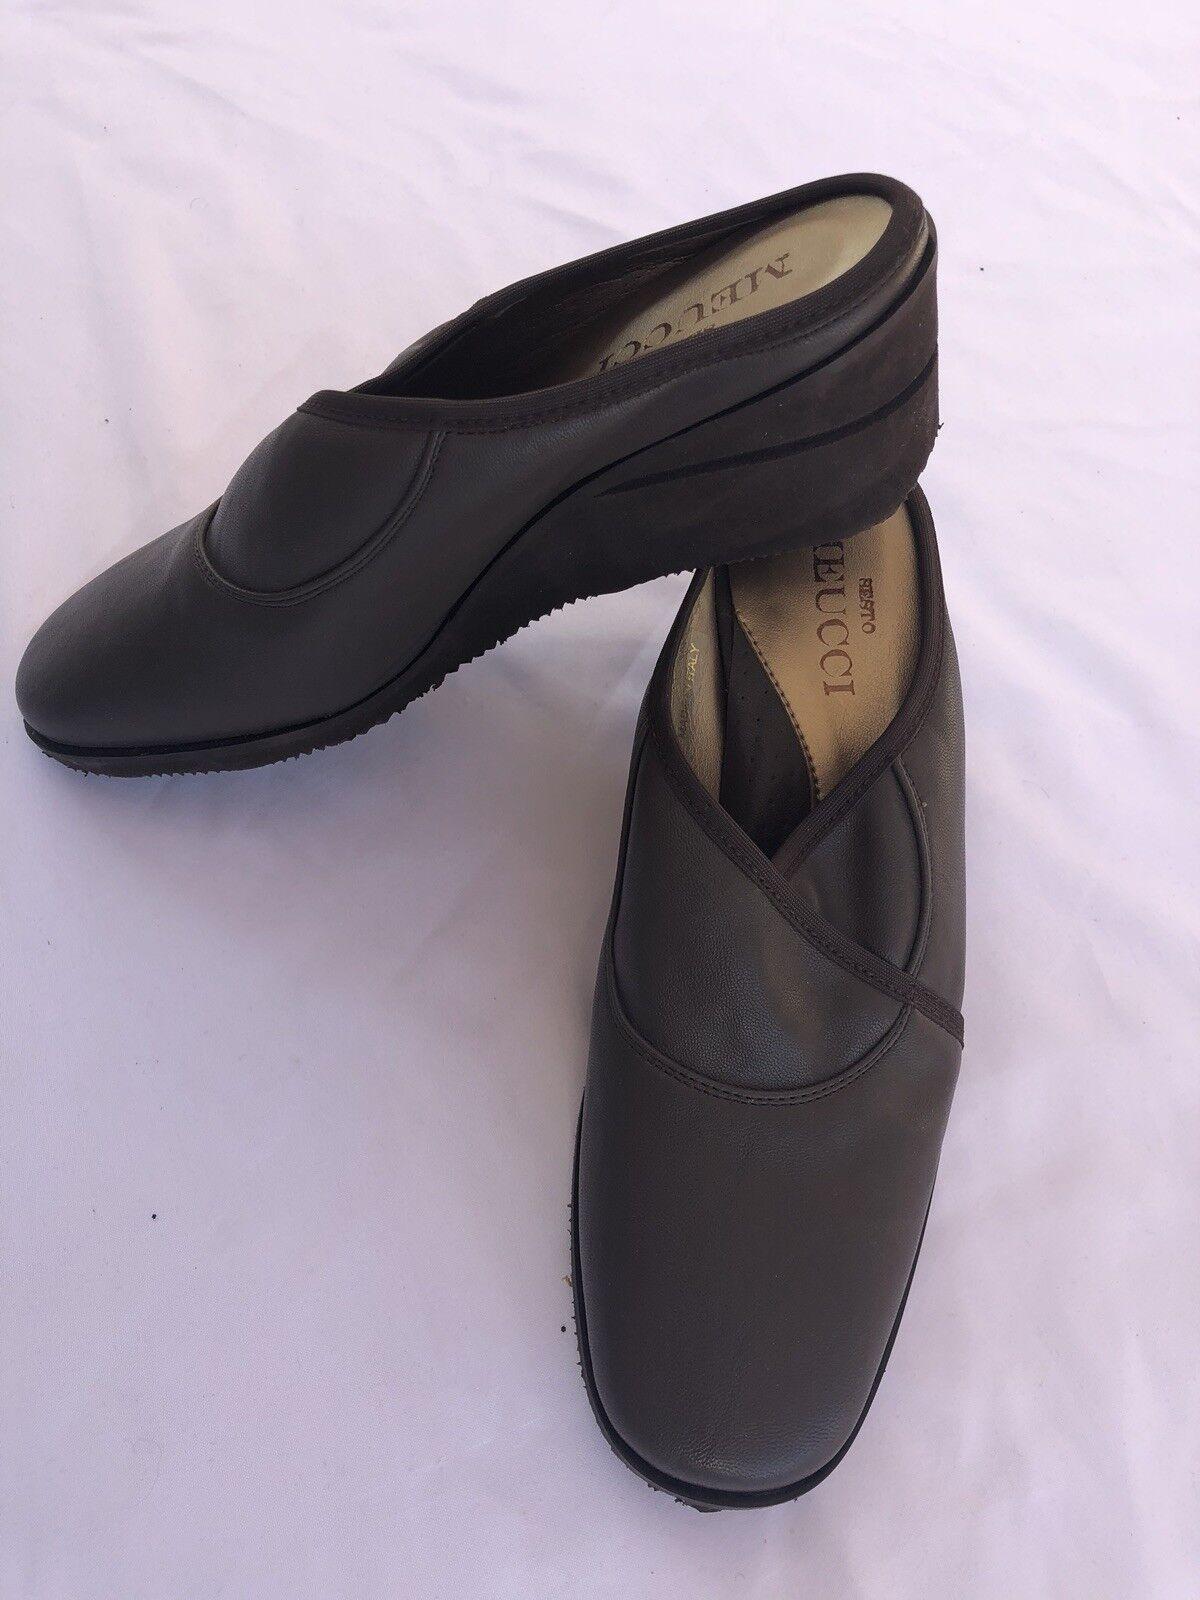 NWOB Sesto Meucci Women's Dark Brown Italian Made Wedge Slip On shoes sz 6M